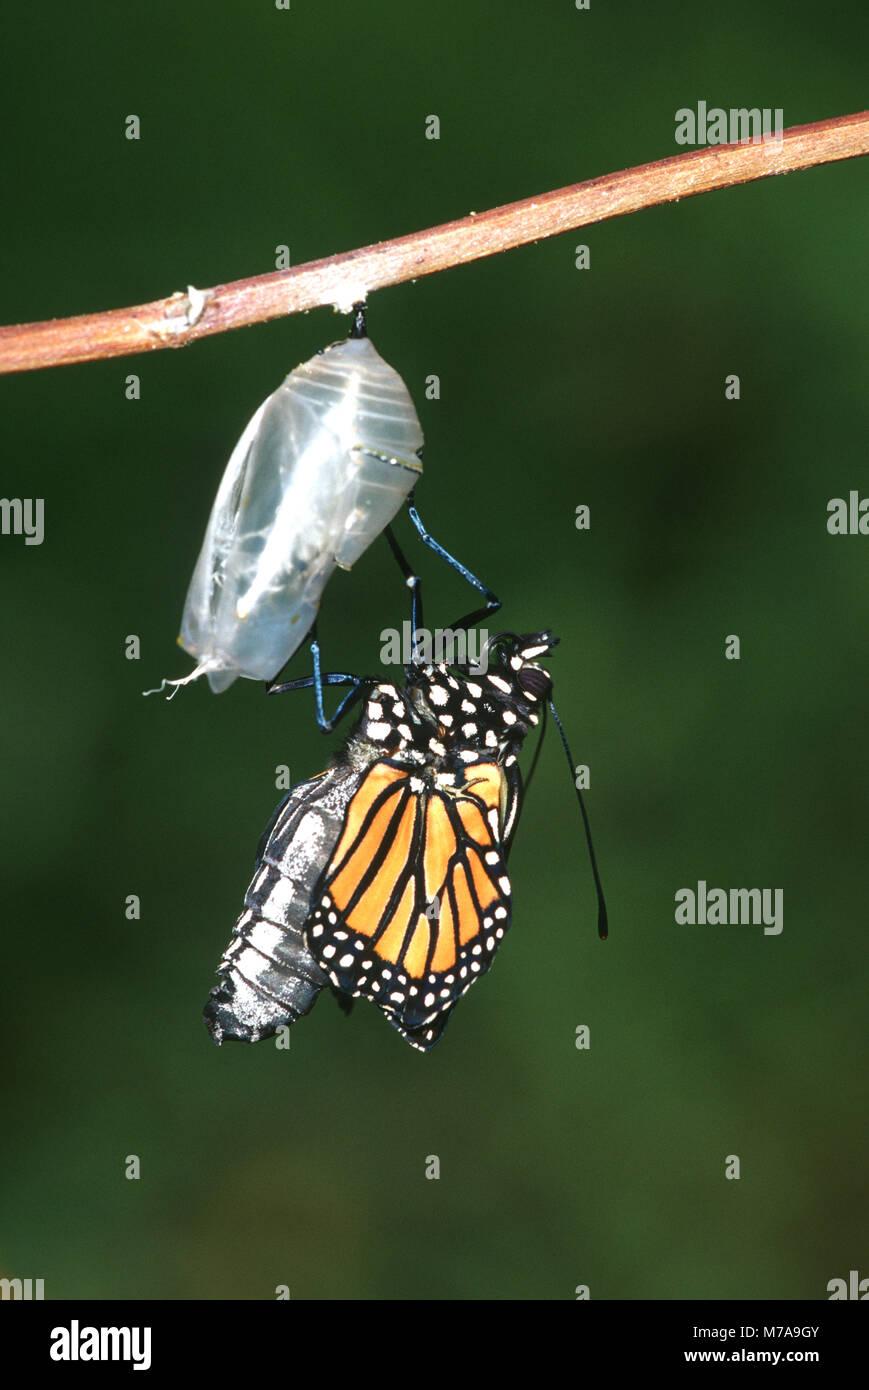 03536-032.09 Monarch (Danaus plexippus) emerging from pupa/chrysalis Marion Co. IL - Stock Image